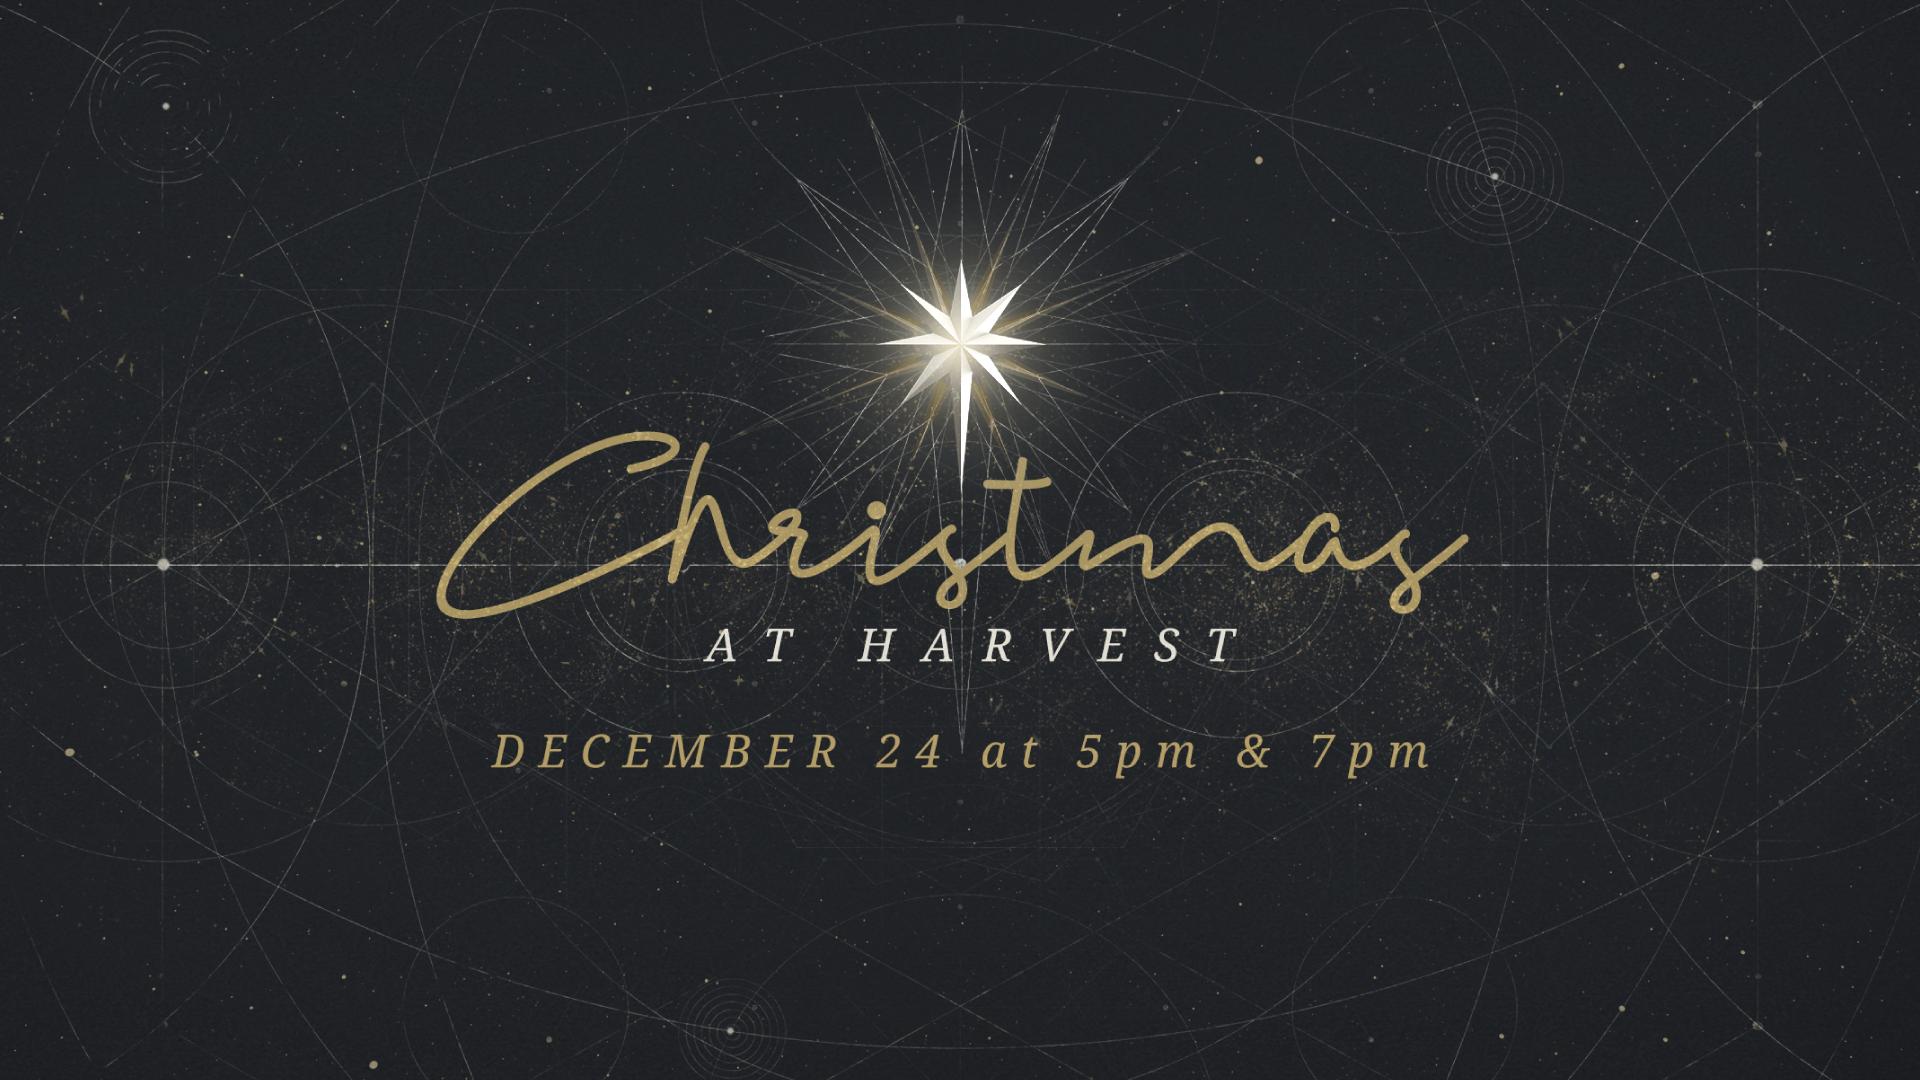 ChristmasServiceAnnouncement.png